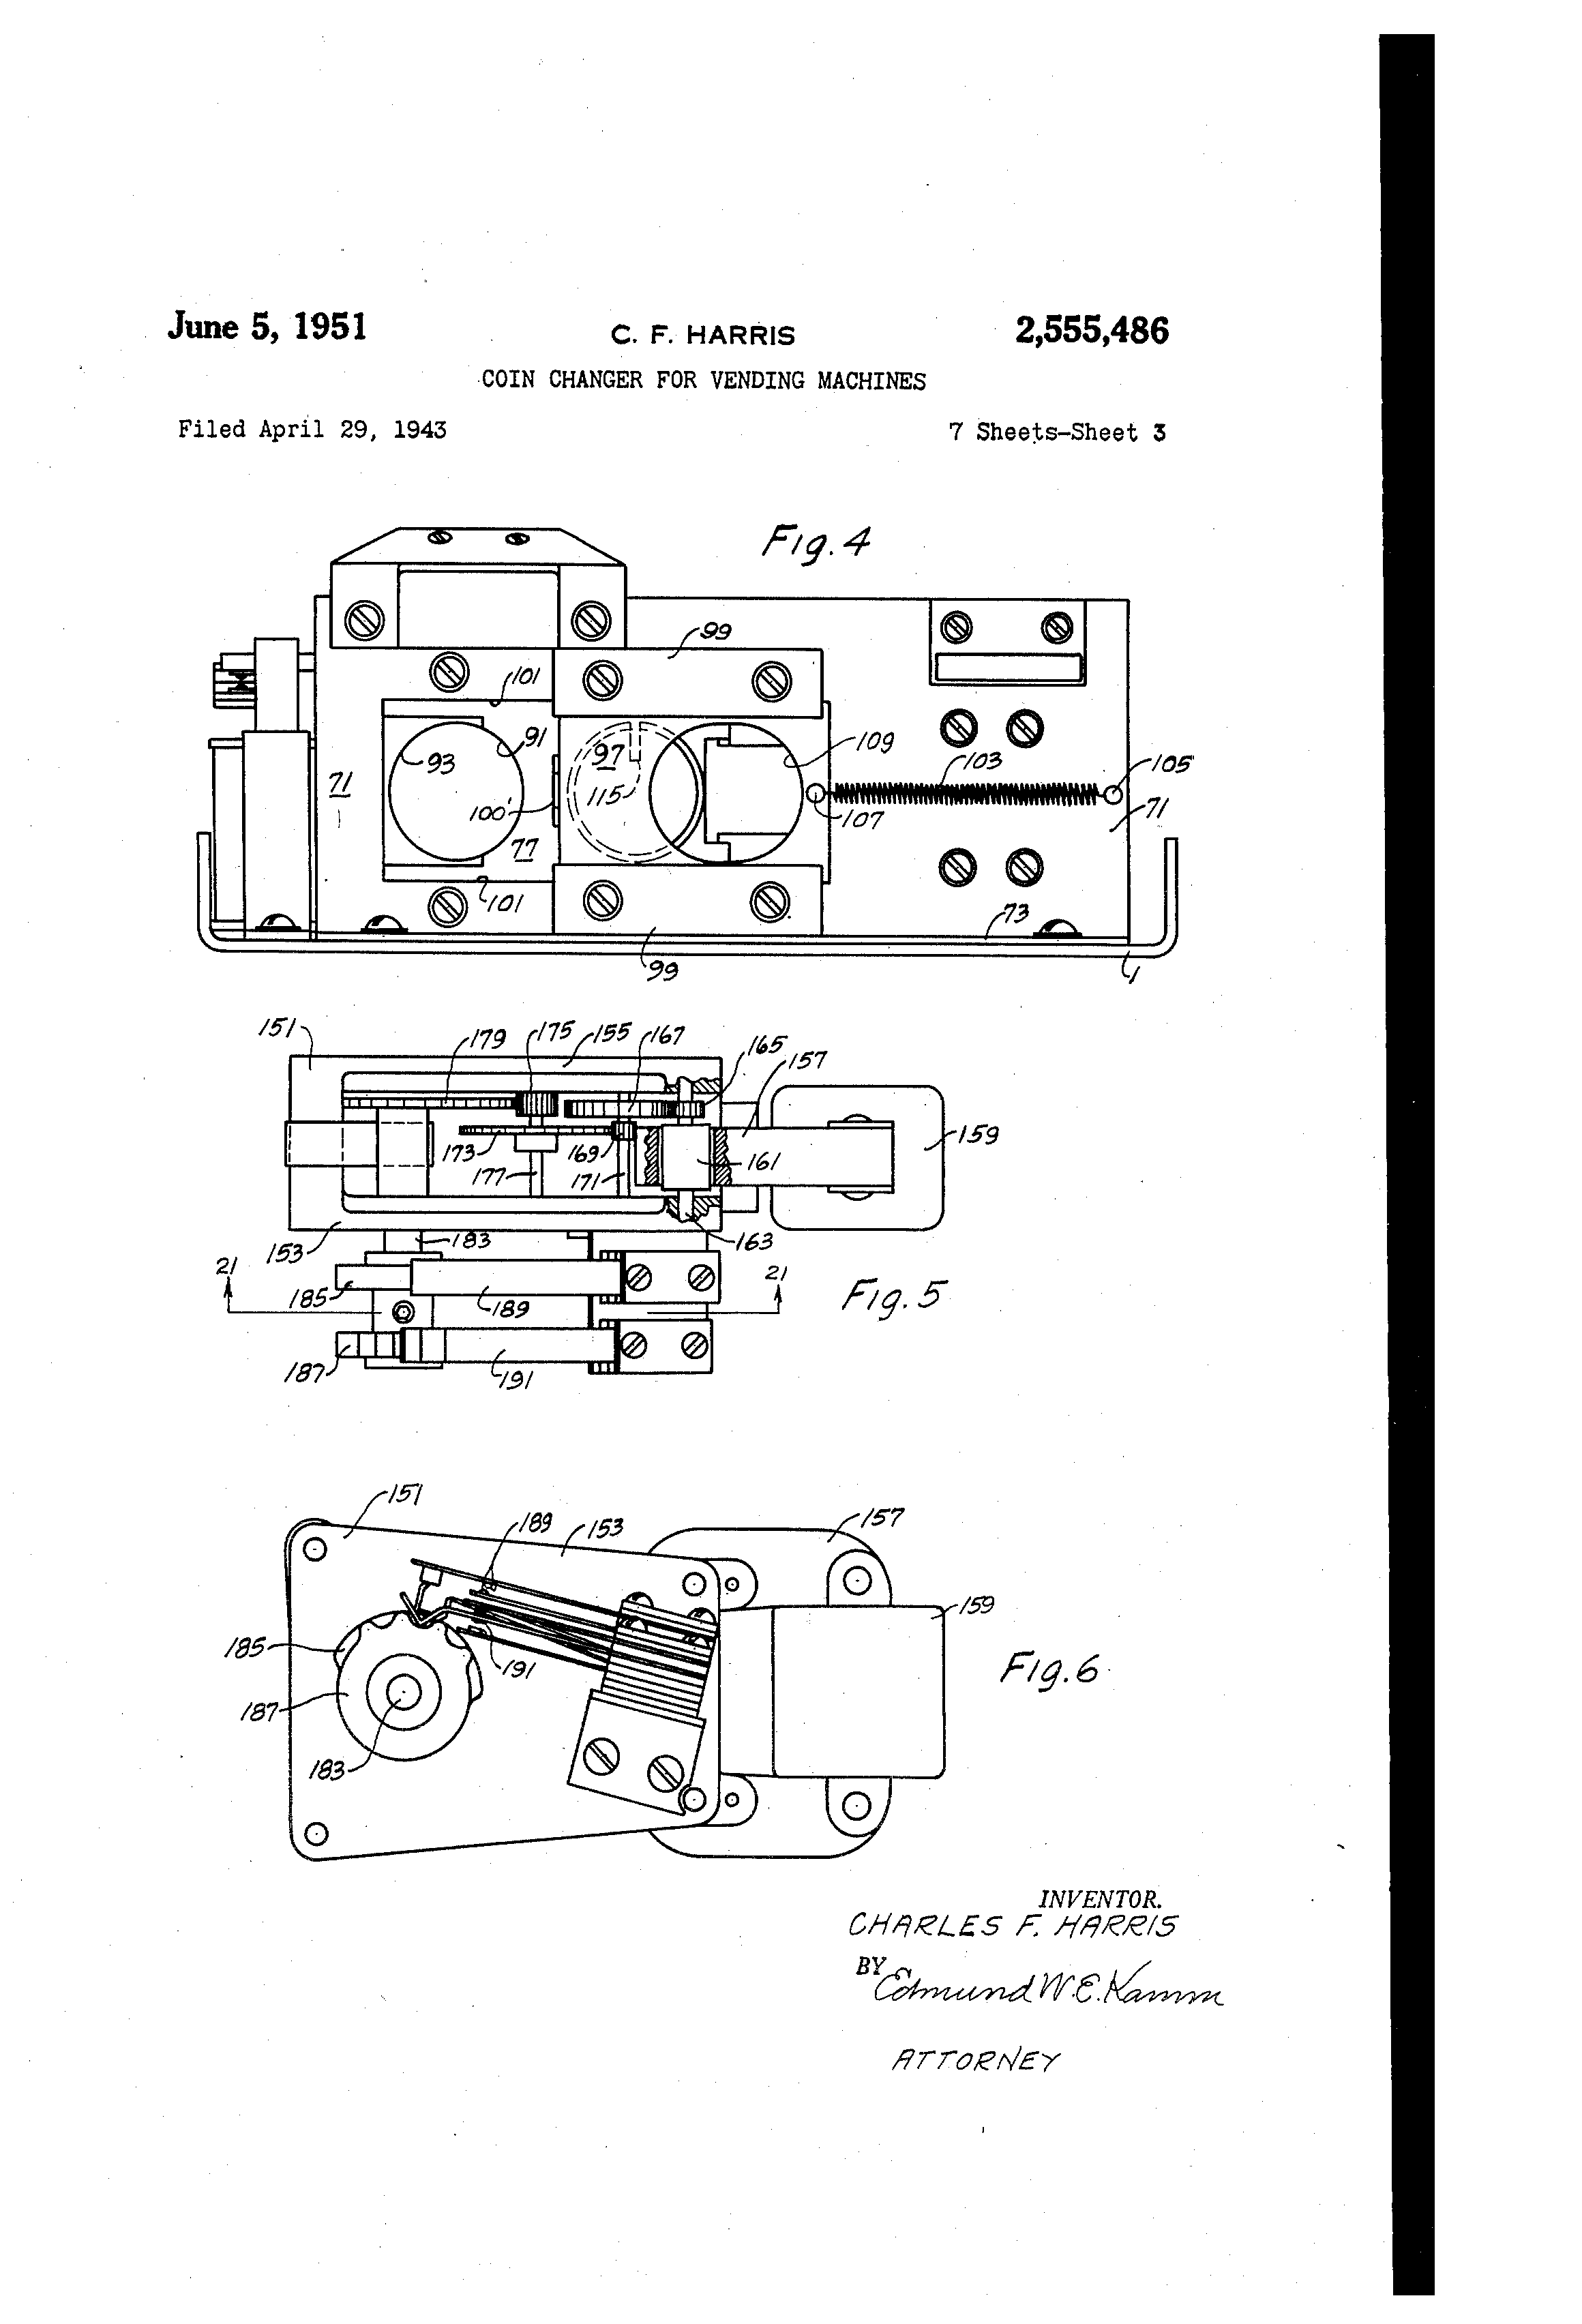 pepsi machine lock motor wiring diagram dixie narco manuals dixie narco vending machine